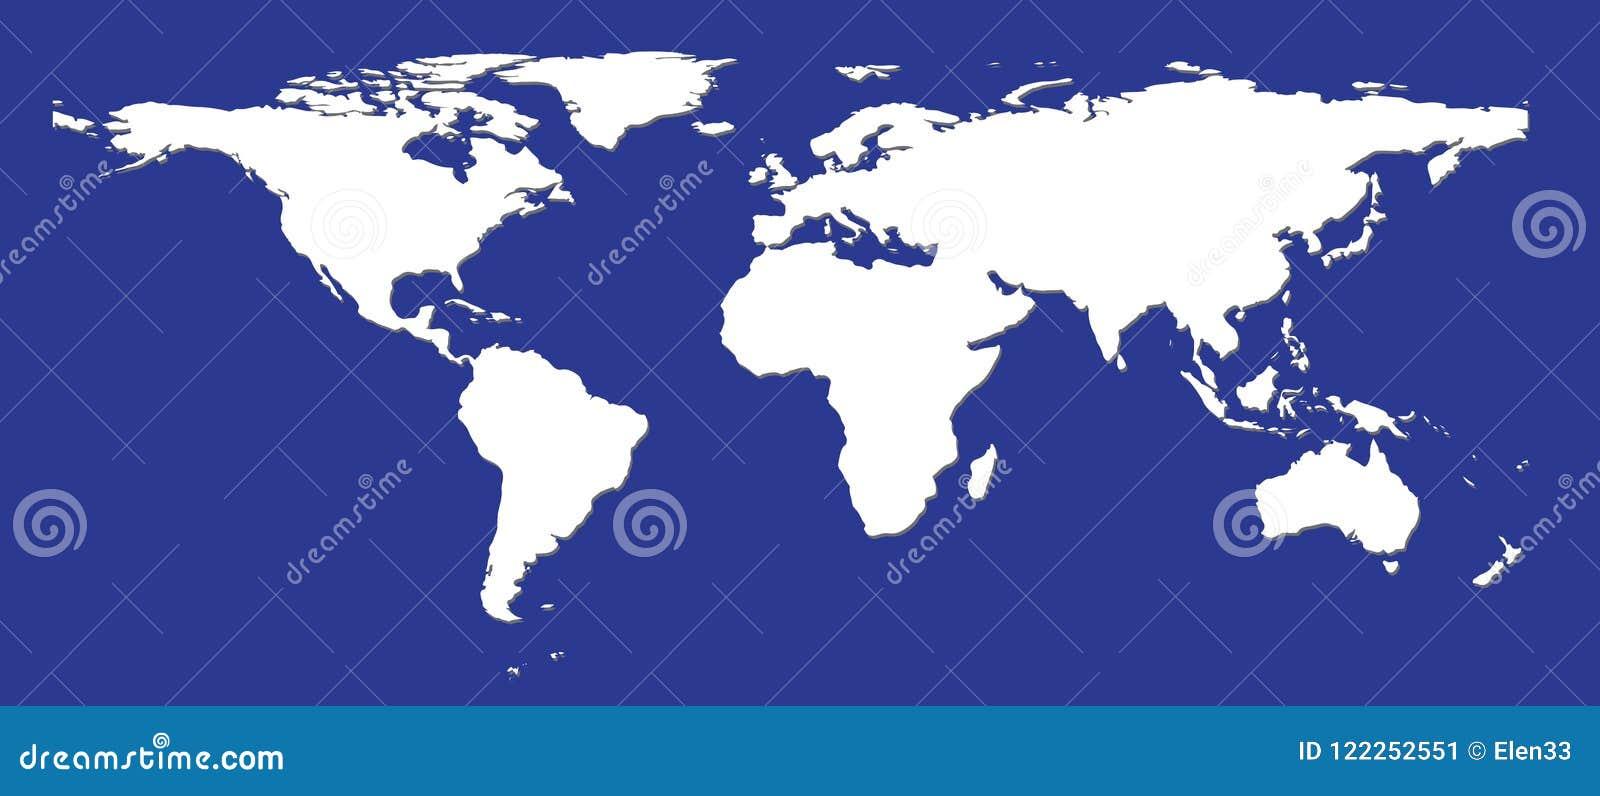 Mapa del mundo blanco plano